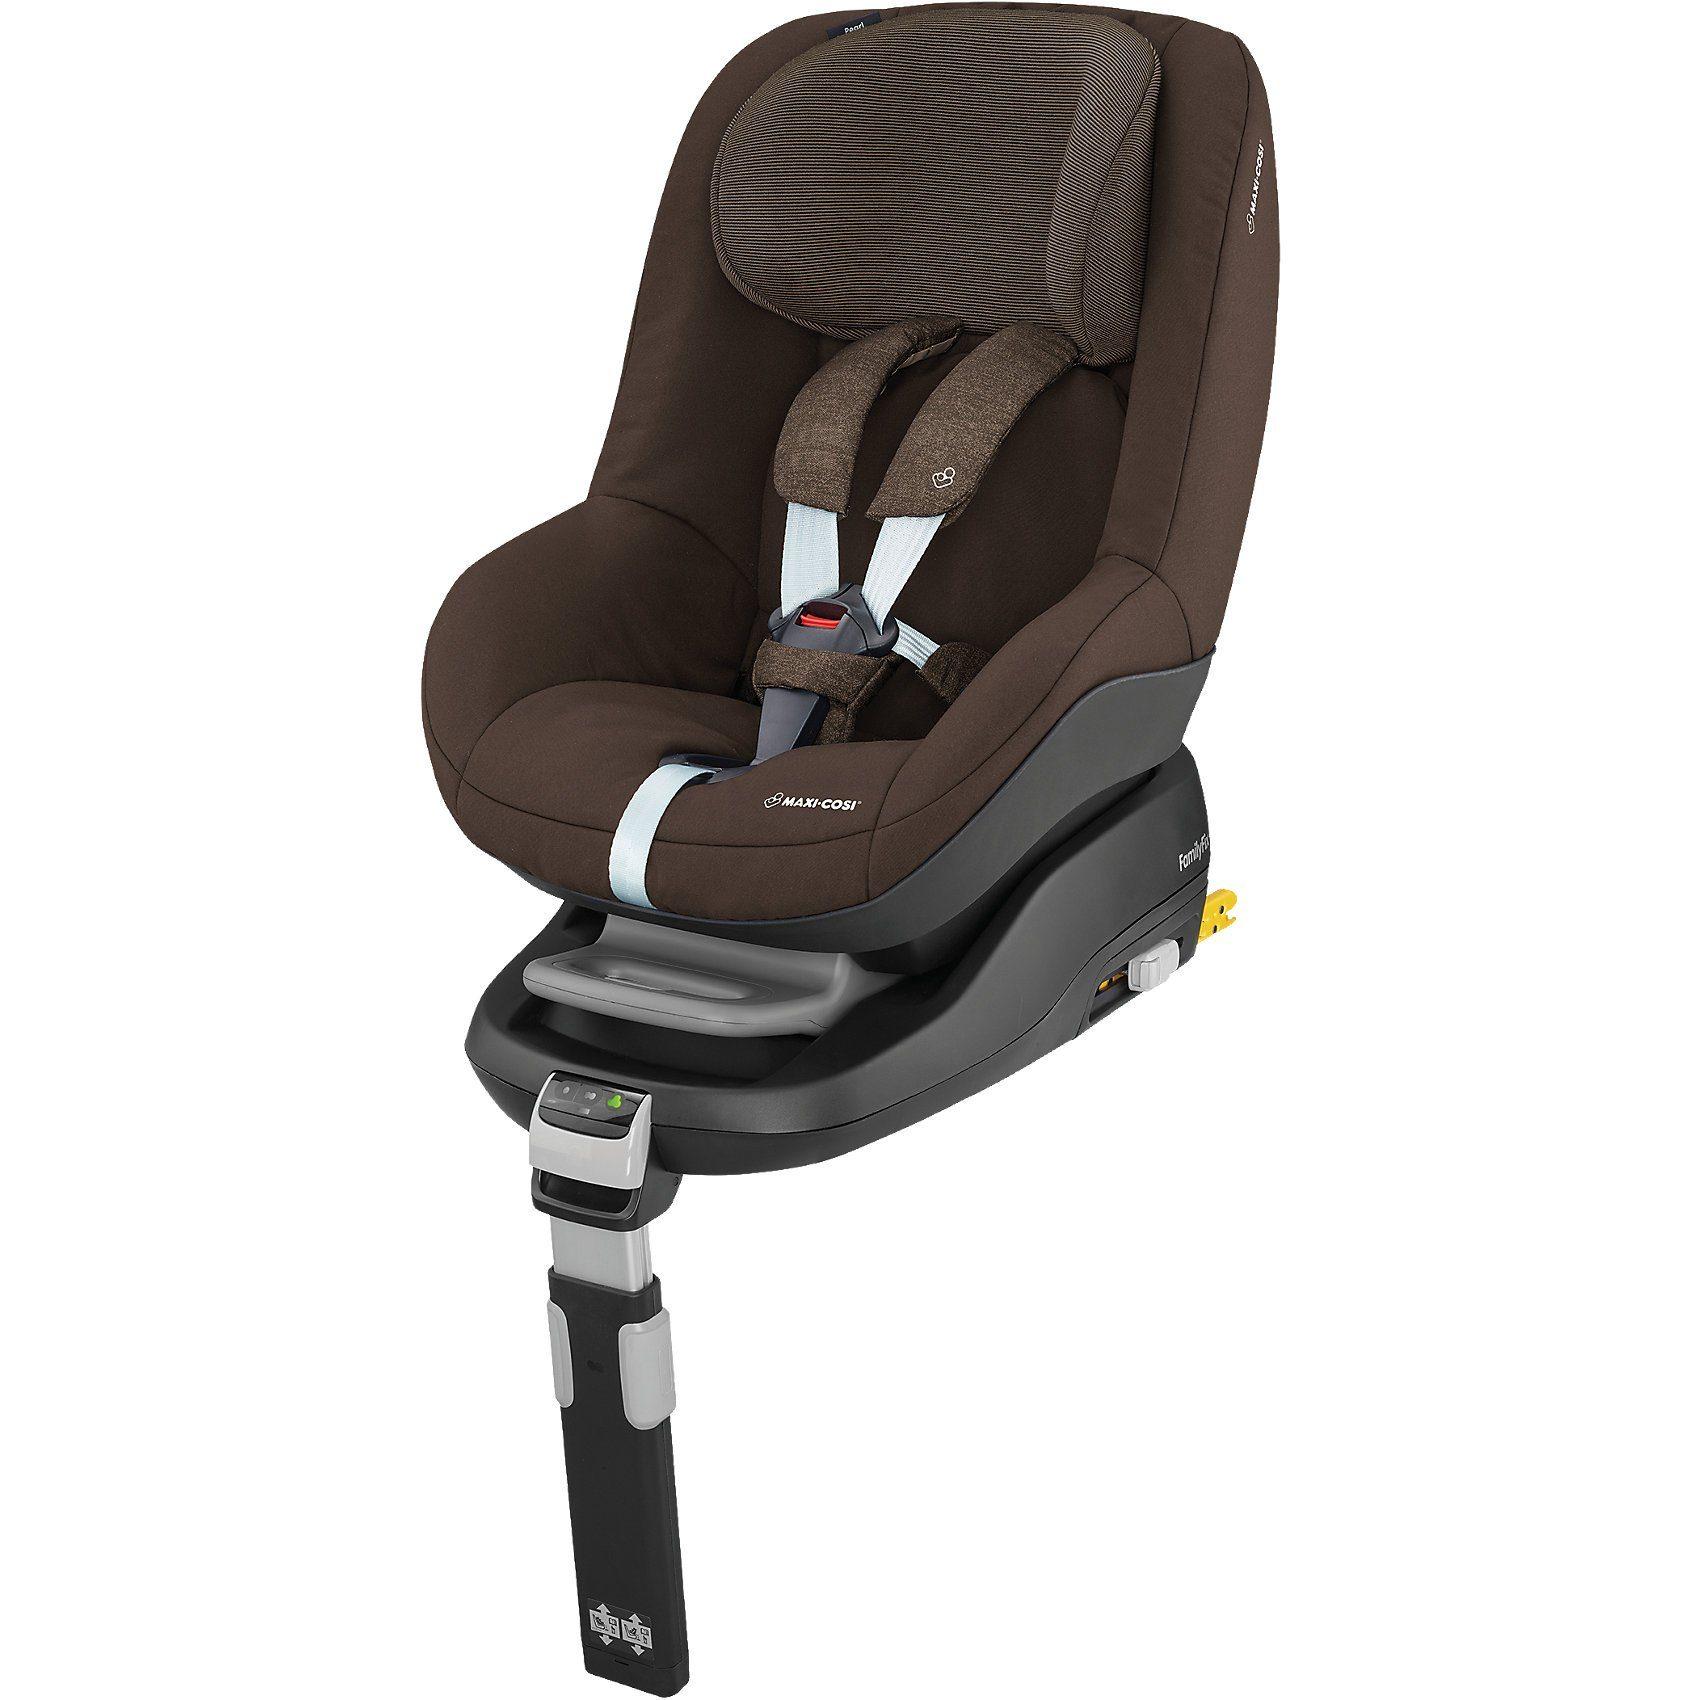 Maxi-Cosi Auto-Kindersitz Pearl, Nomad Brown, 2018